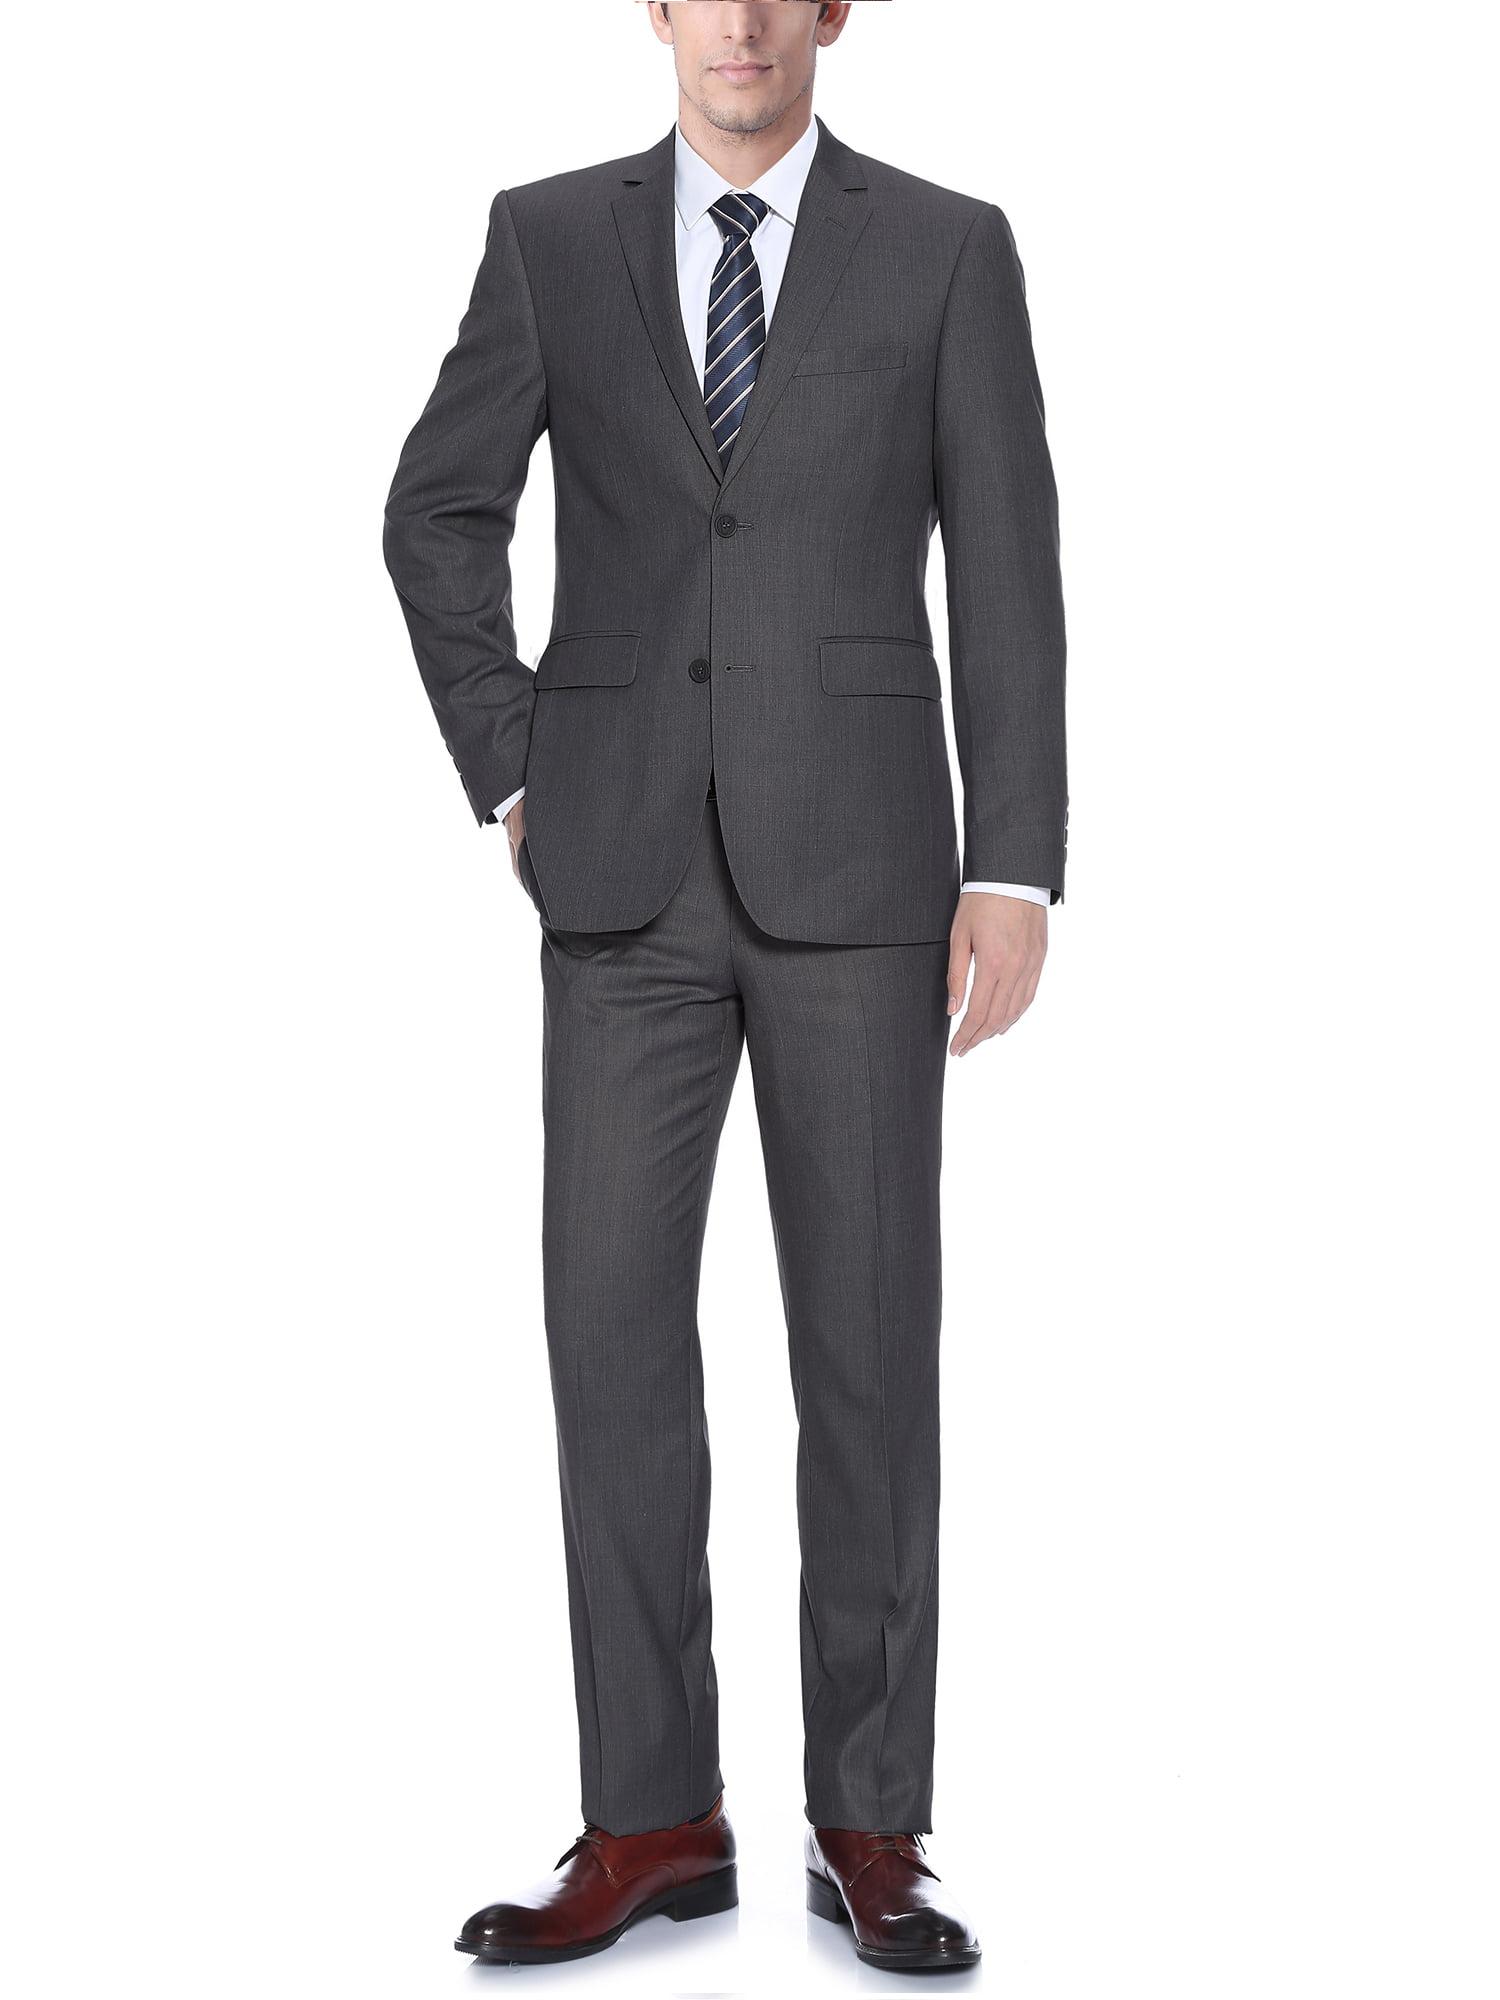 Barzetti Big Men's Dark Grey Classic Fit Italian Styled Two Piece Suit